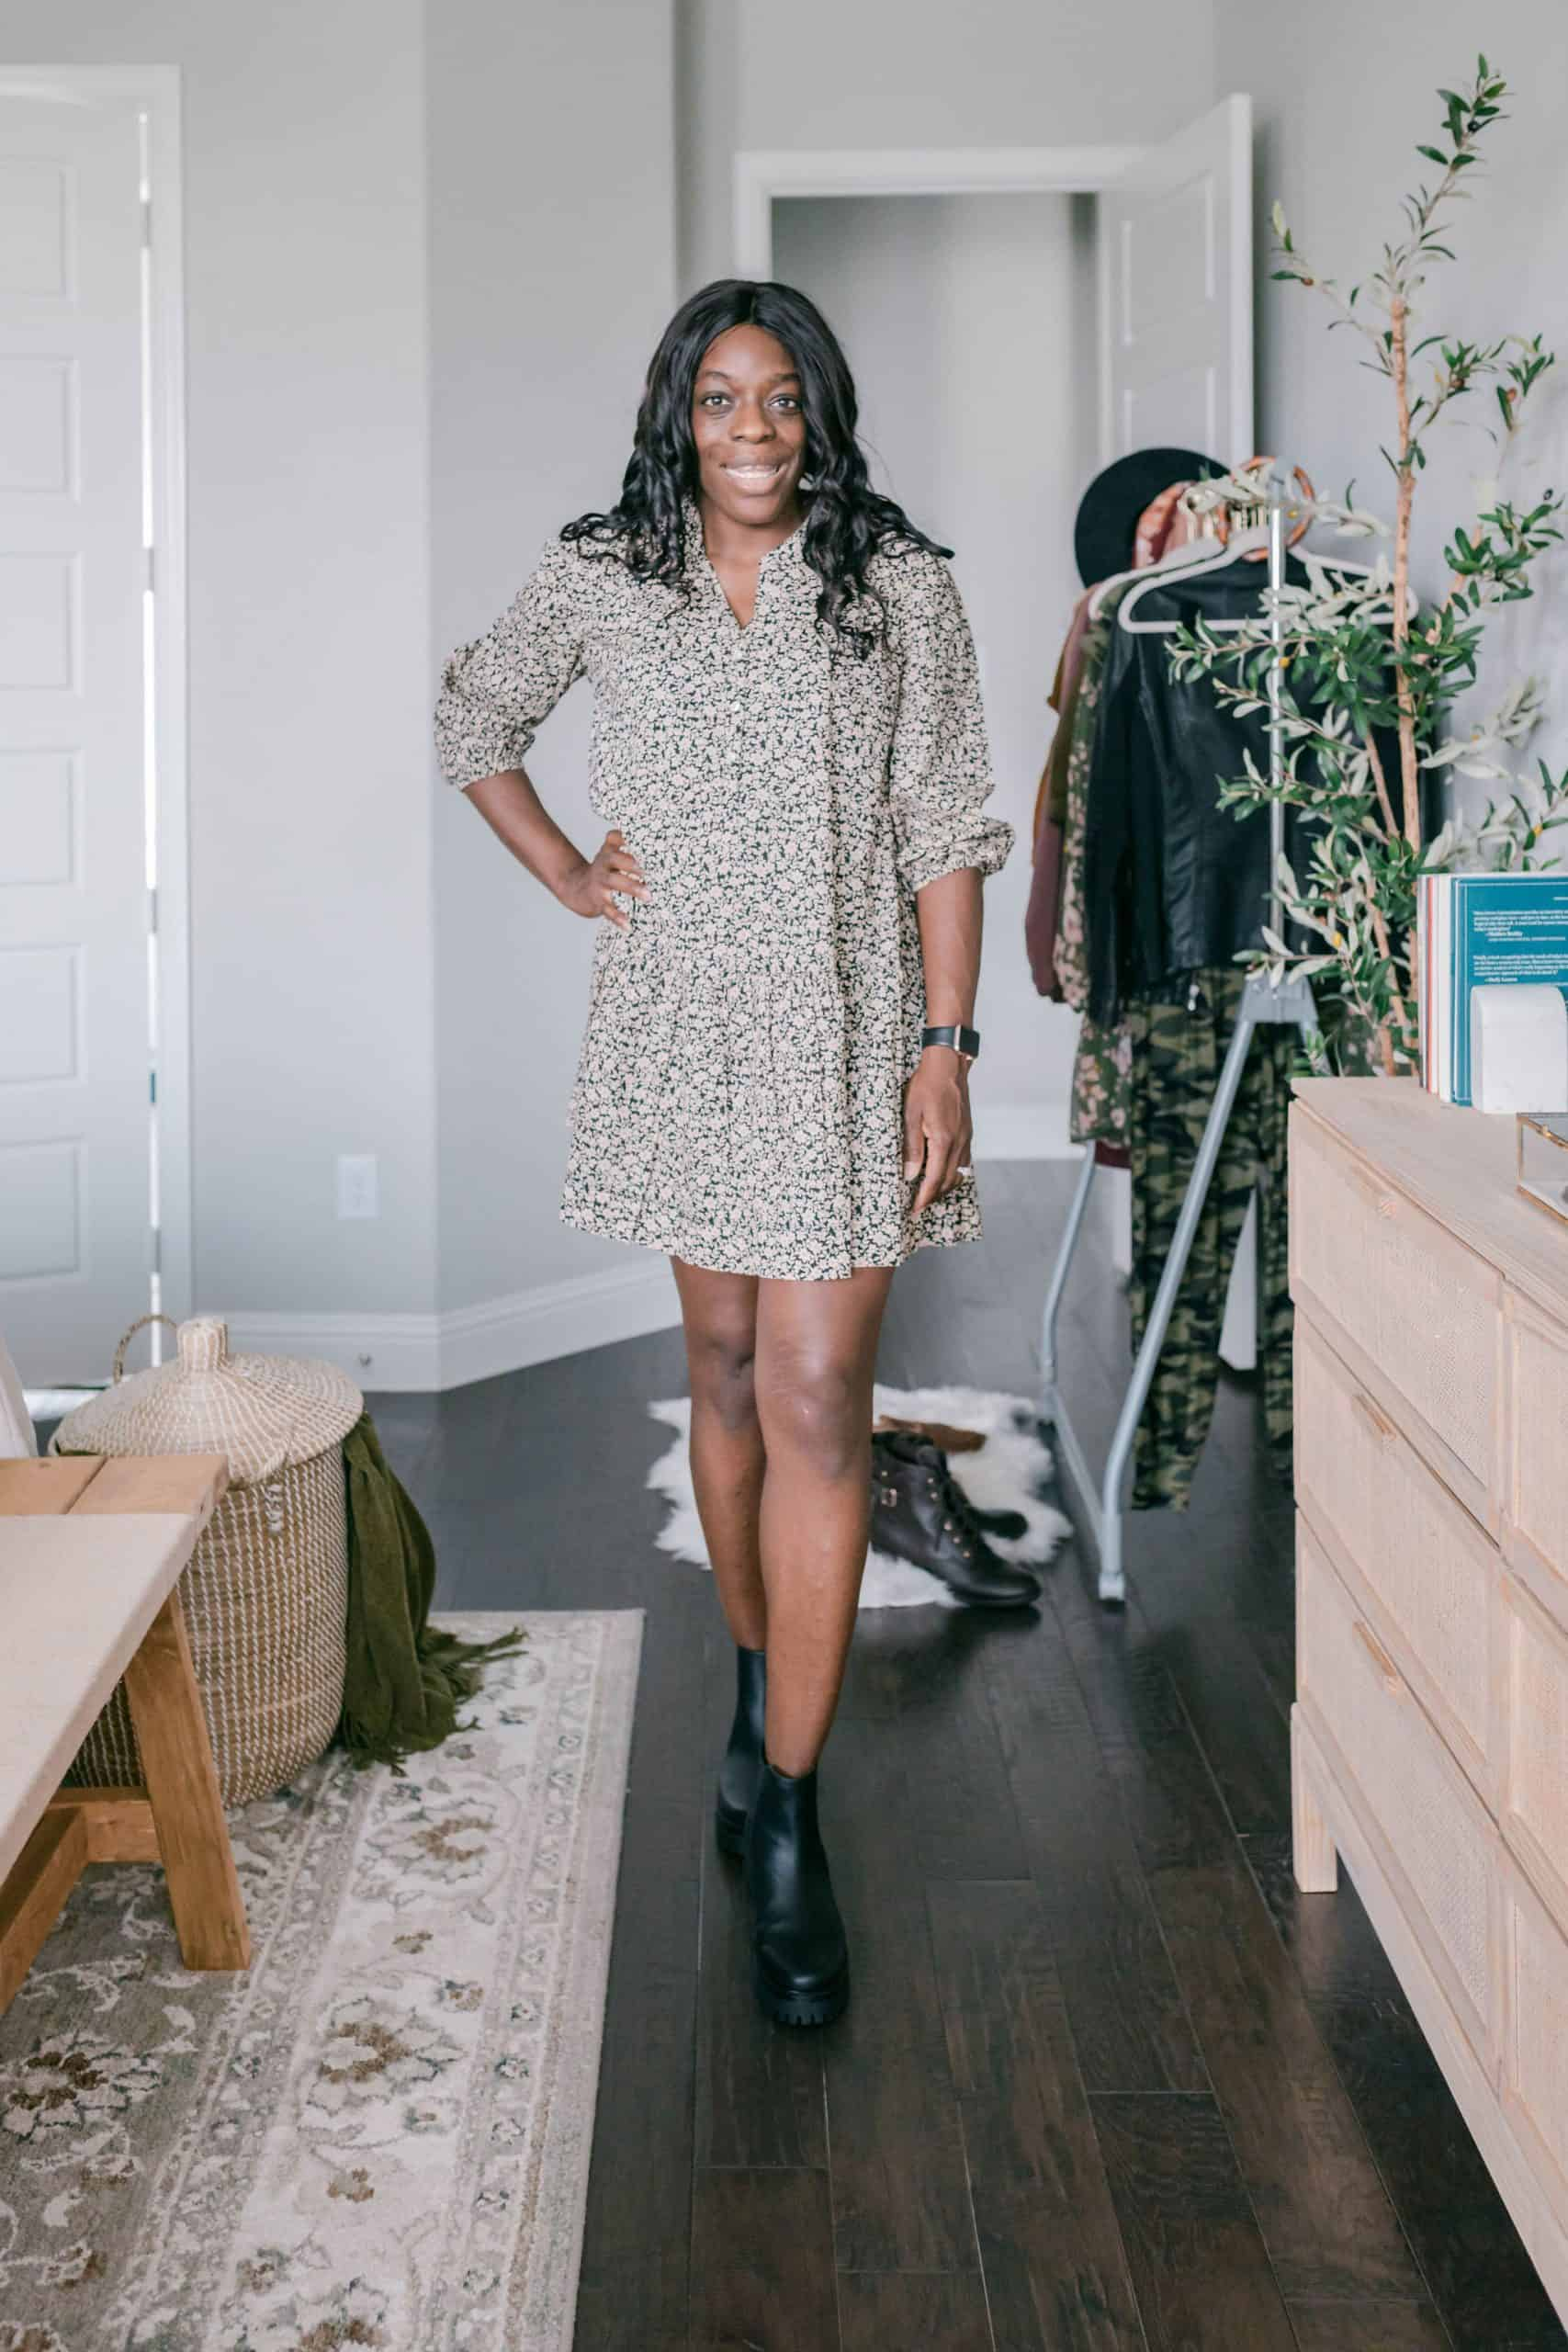 Modeling dress in bedroom